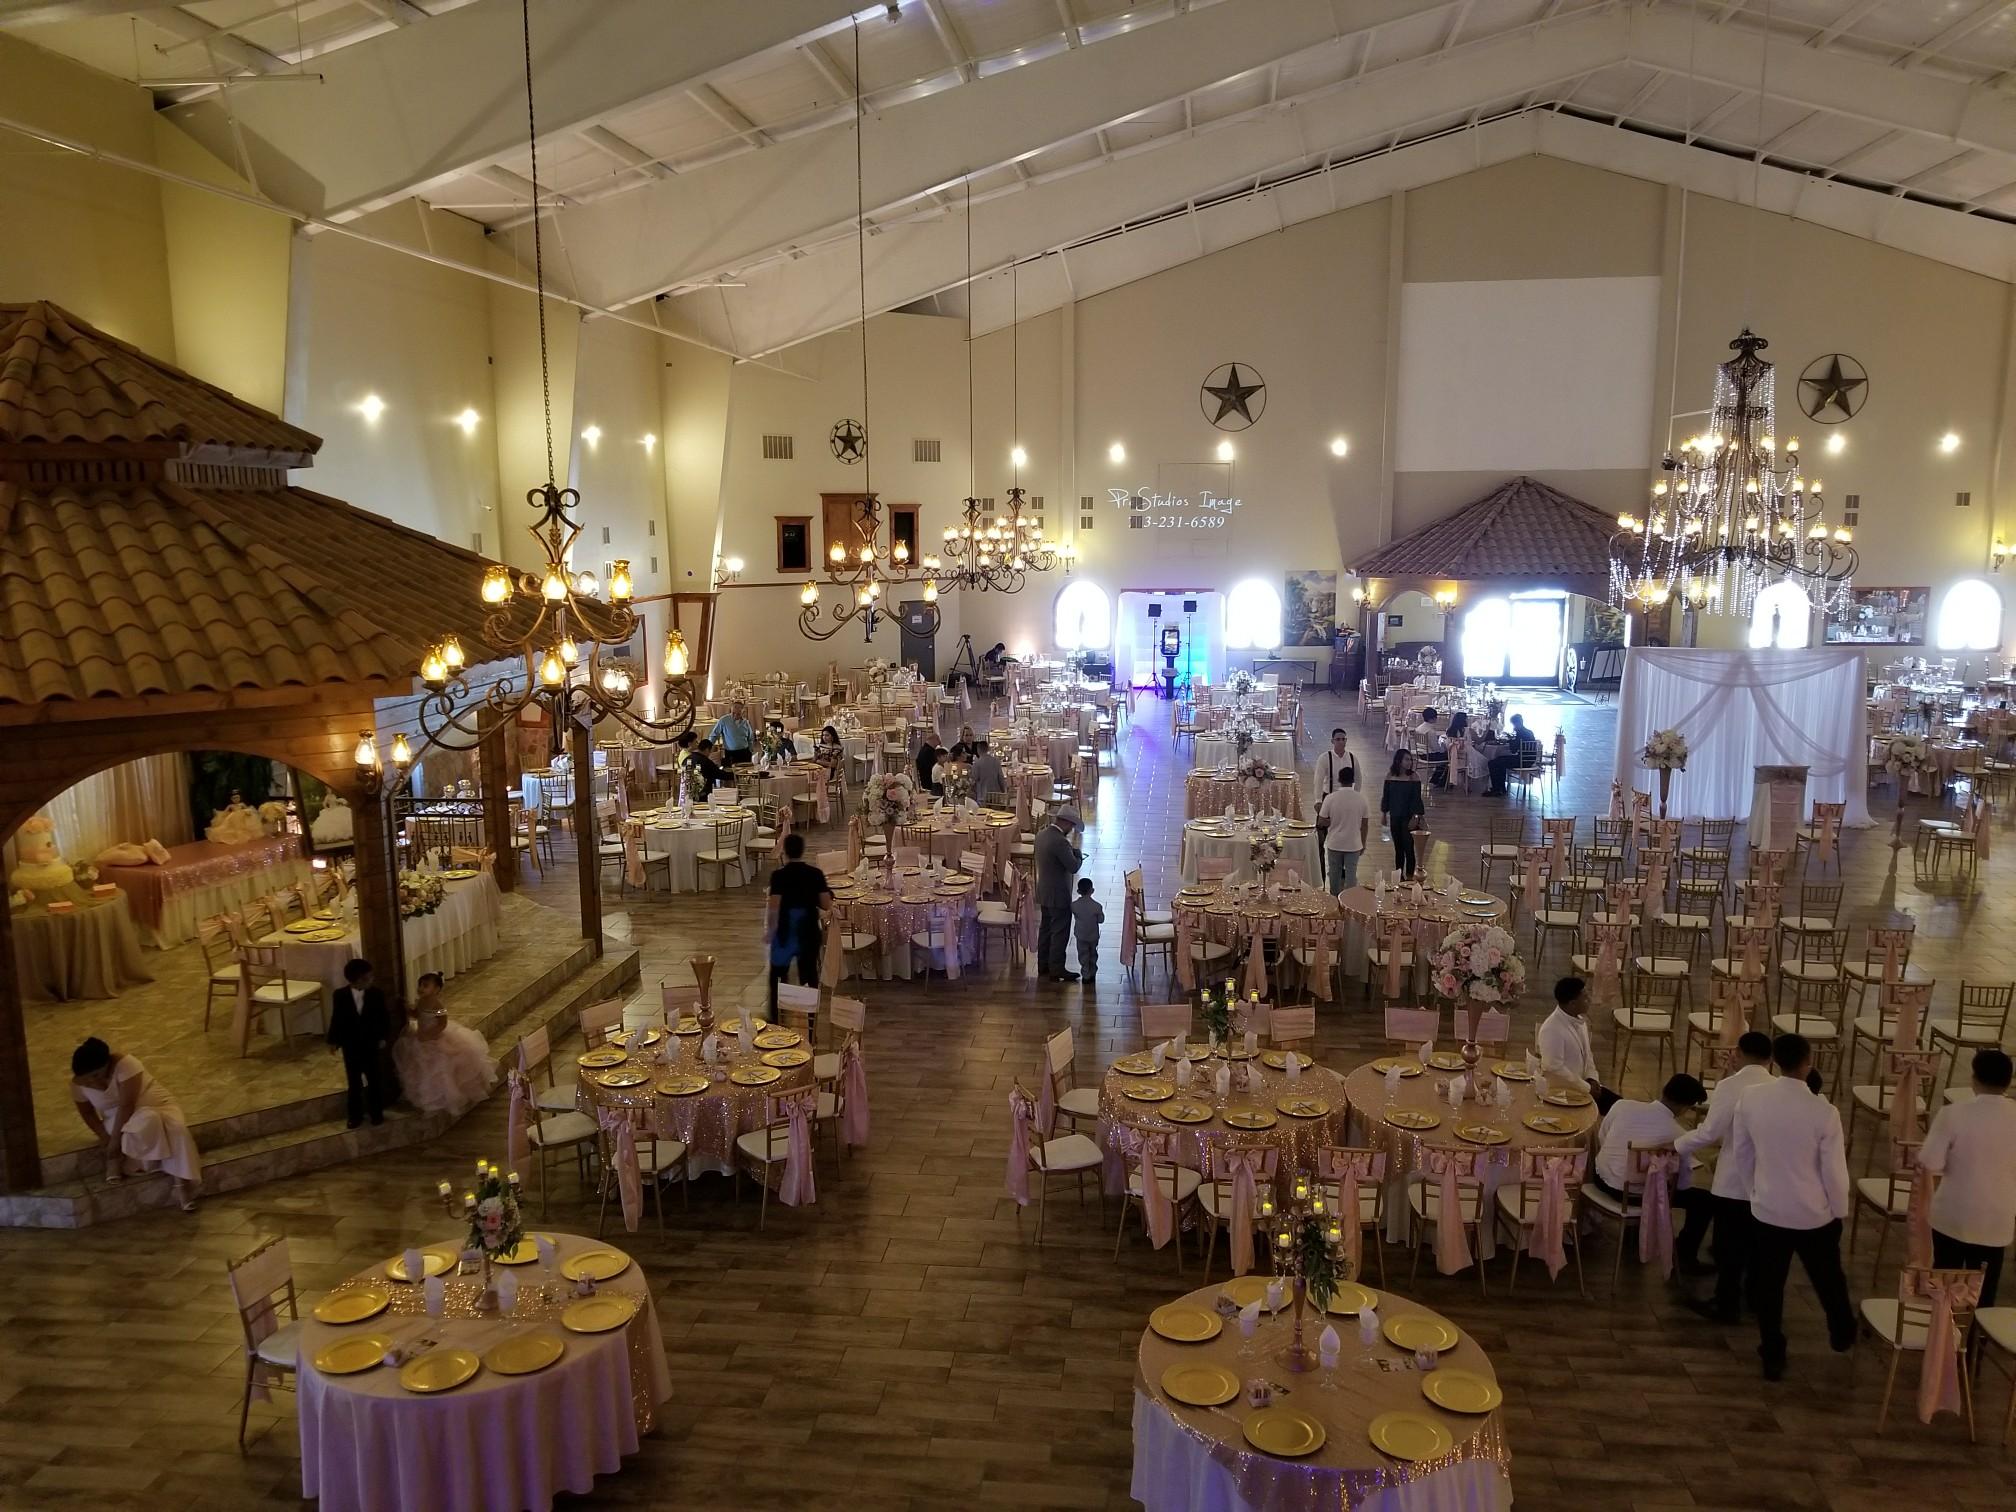 Herrera S Event Hall 7815 John Ralston Rd Houston Tx